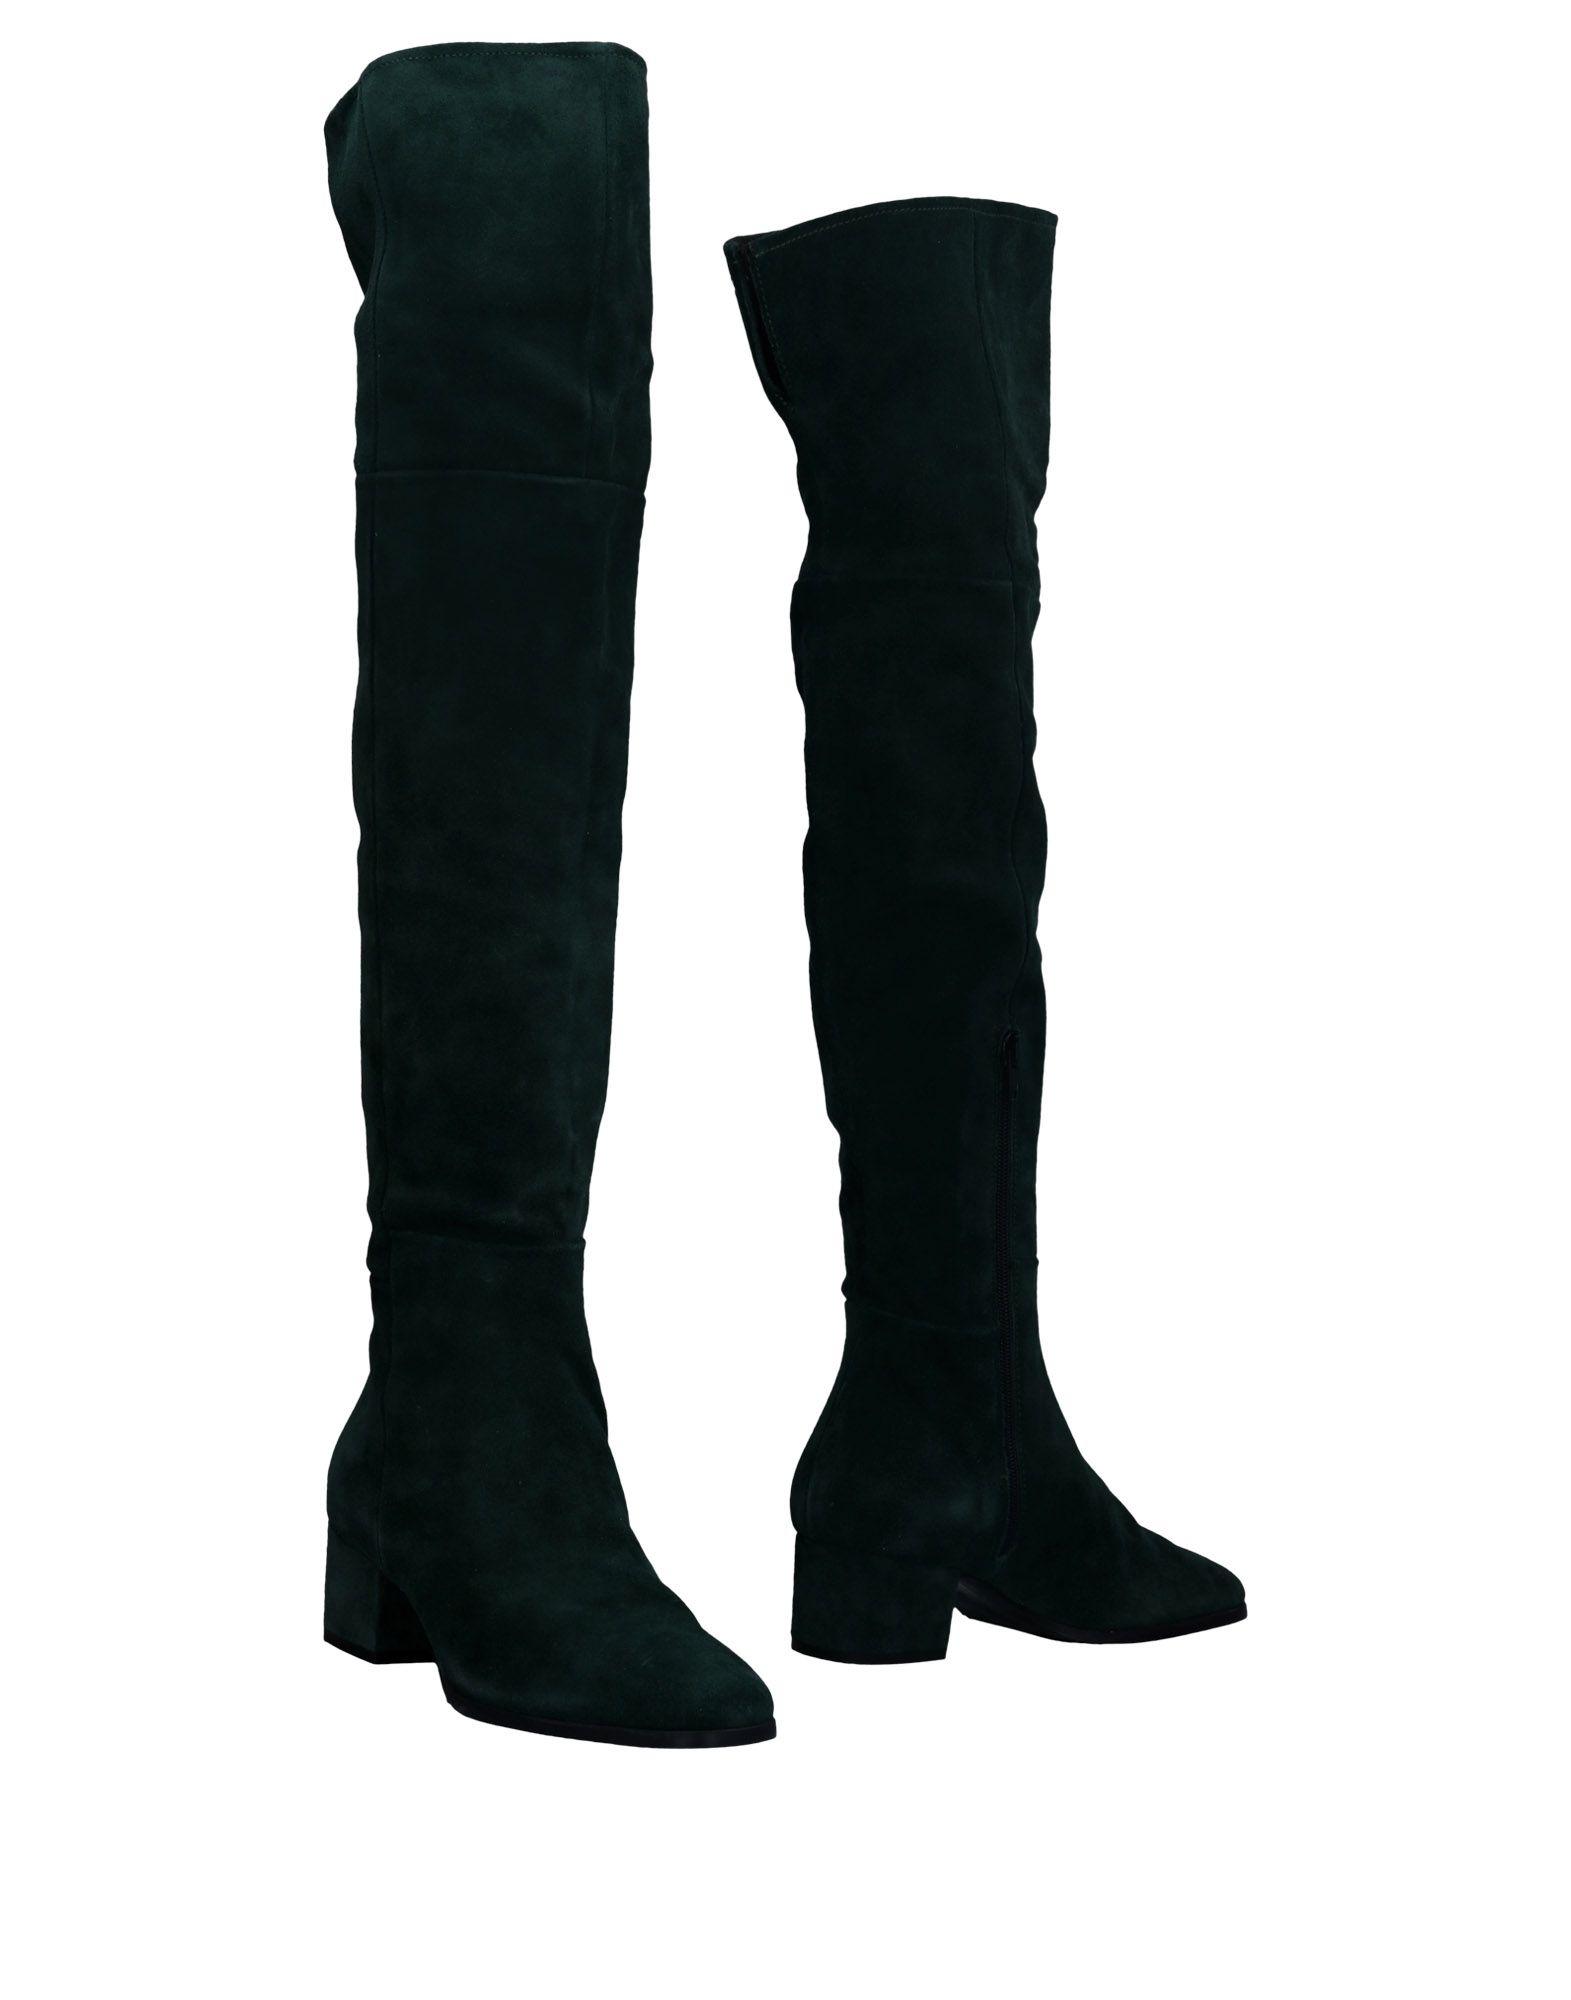 Paola Ferri Stiefel Damen  11225786WXGut aussehende strapazierfähige Schuhe